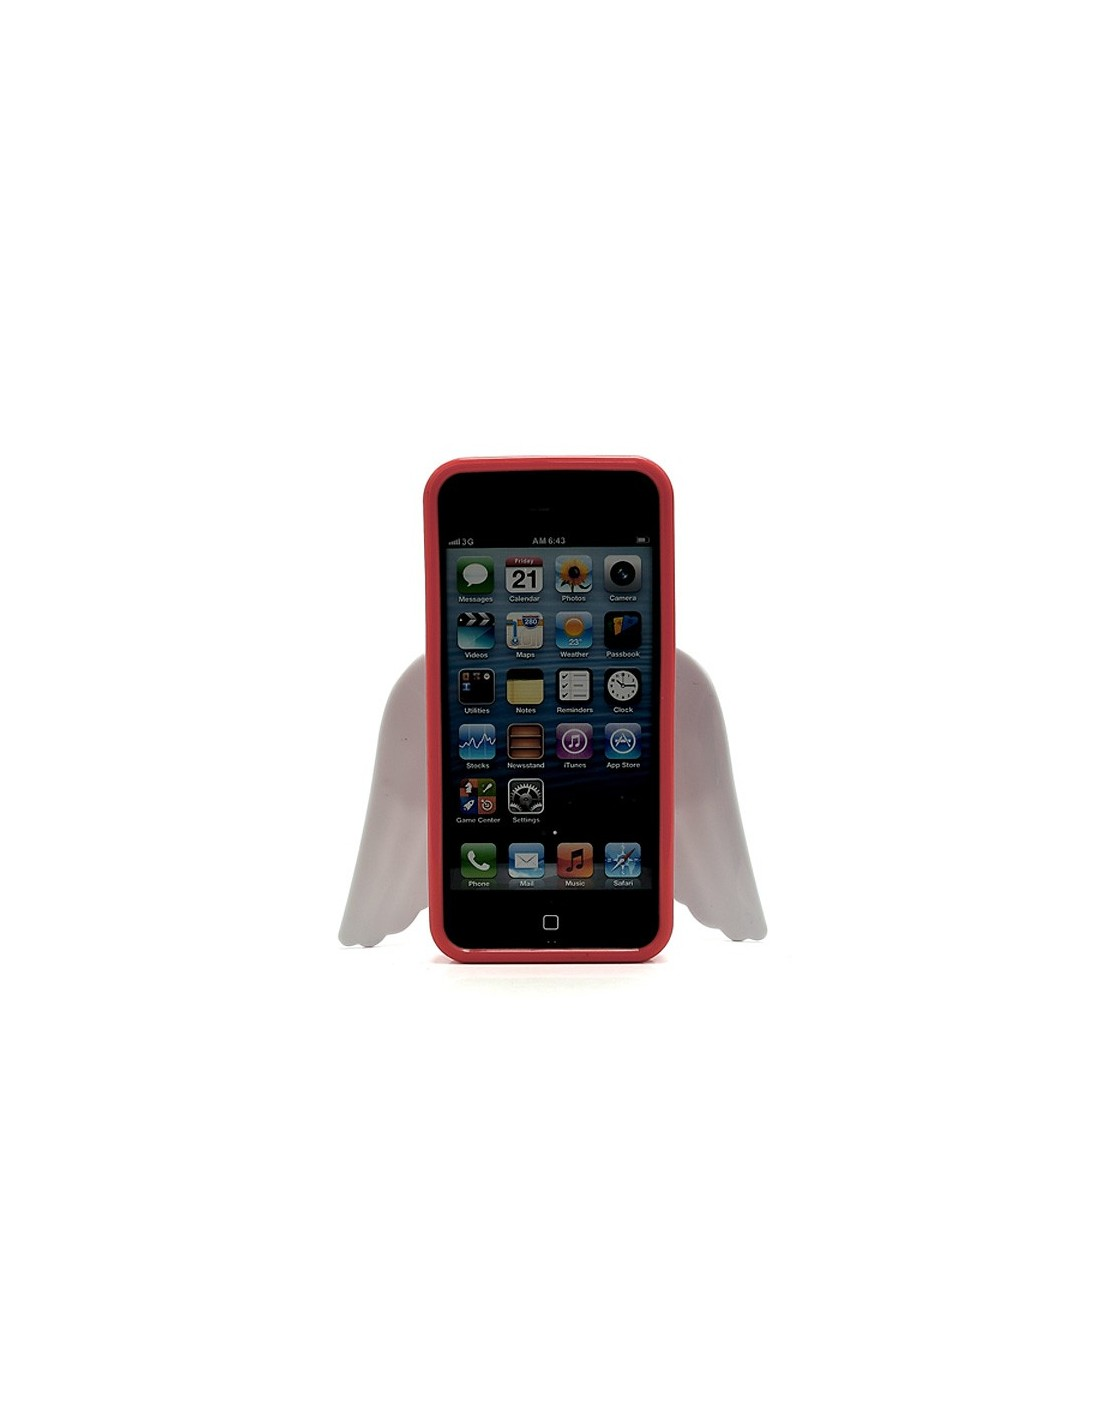 grosse coque iphone 5